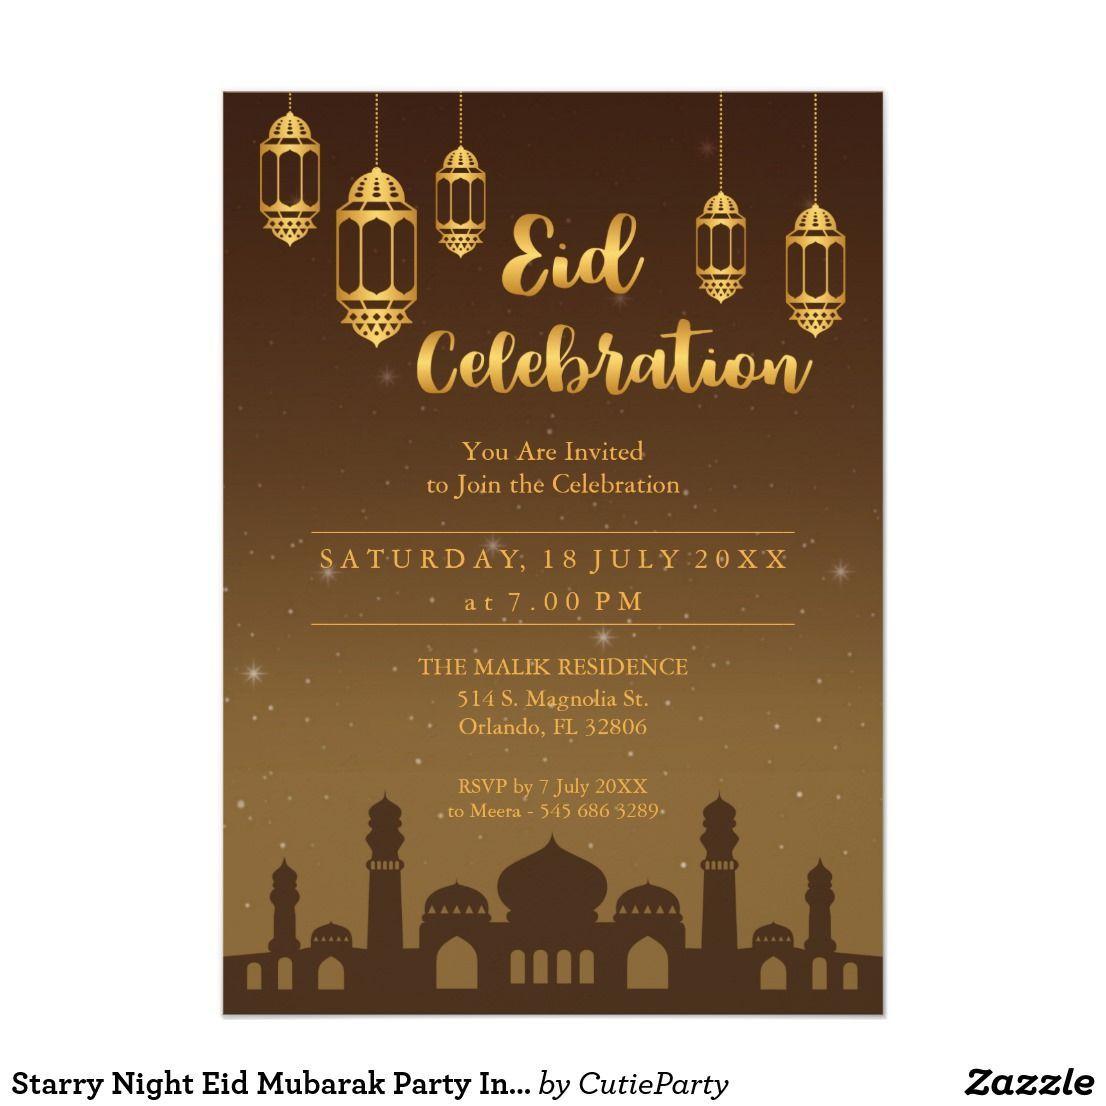 9 New Ideas Template Invitation Eid Card In 2020 Party Invite Template Party Invitations Eid Party